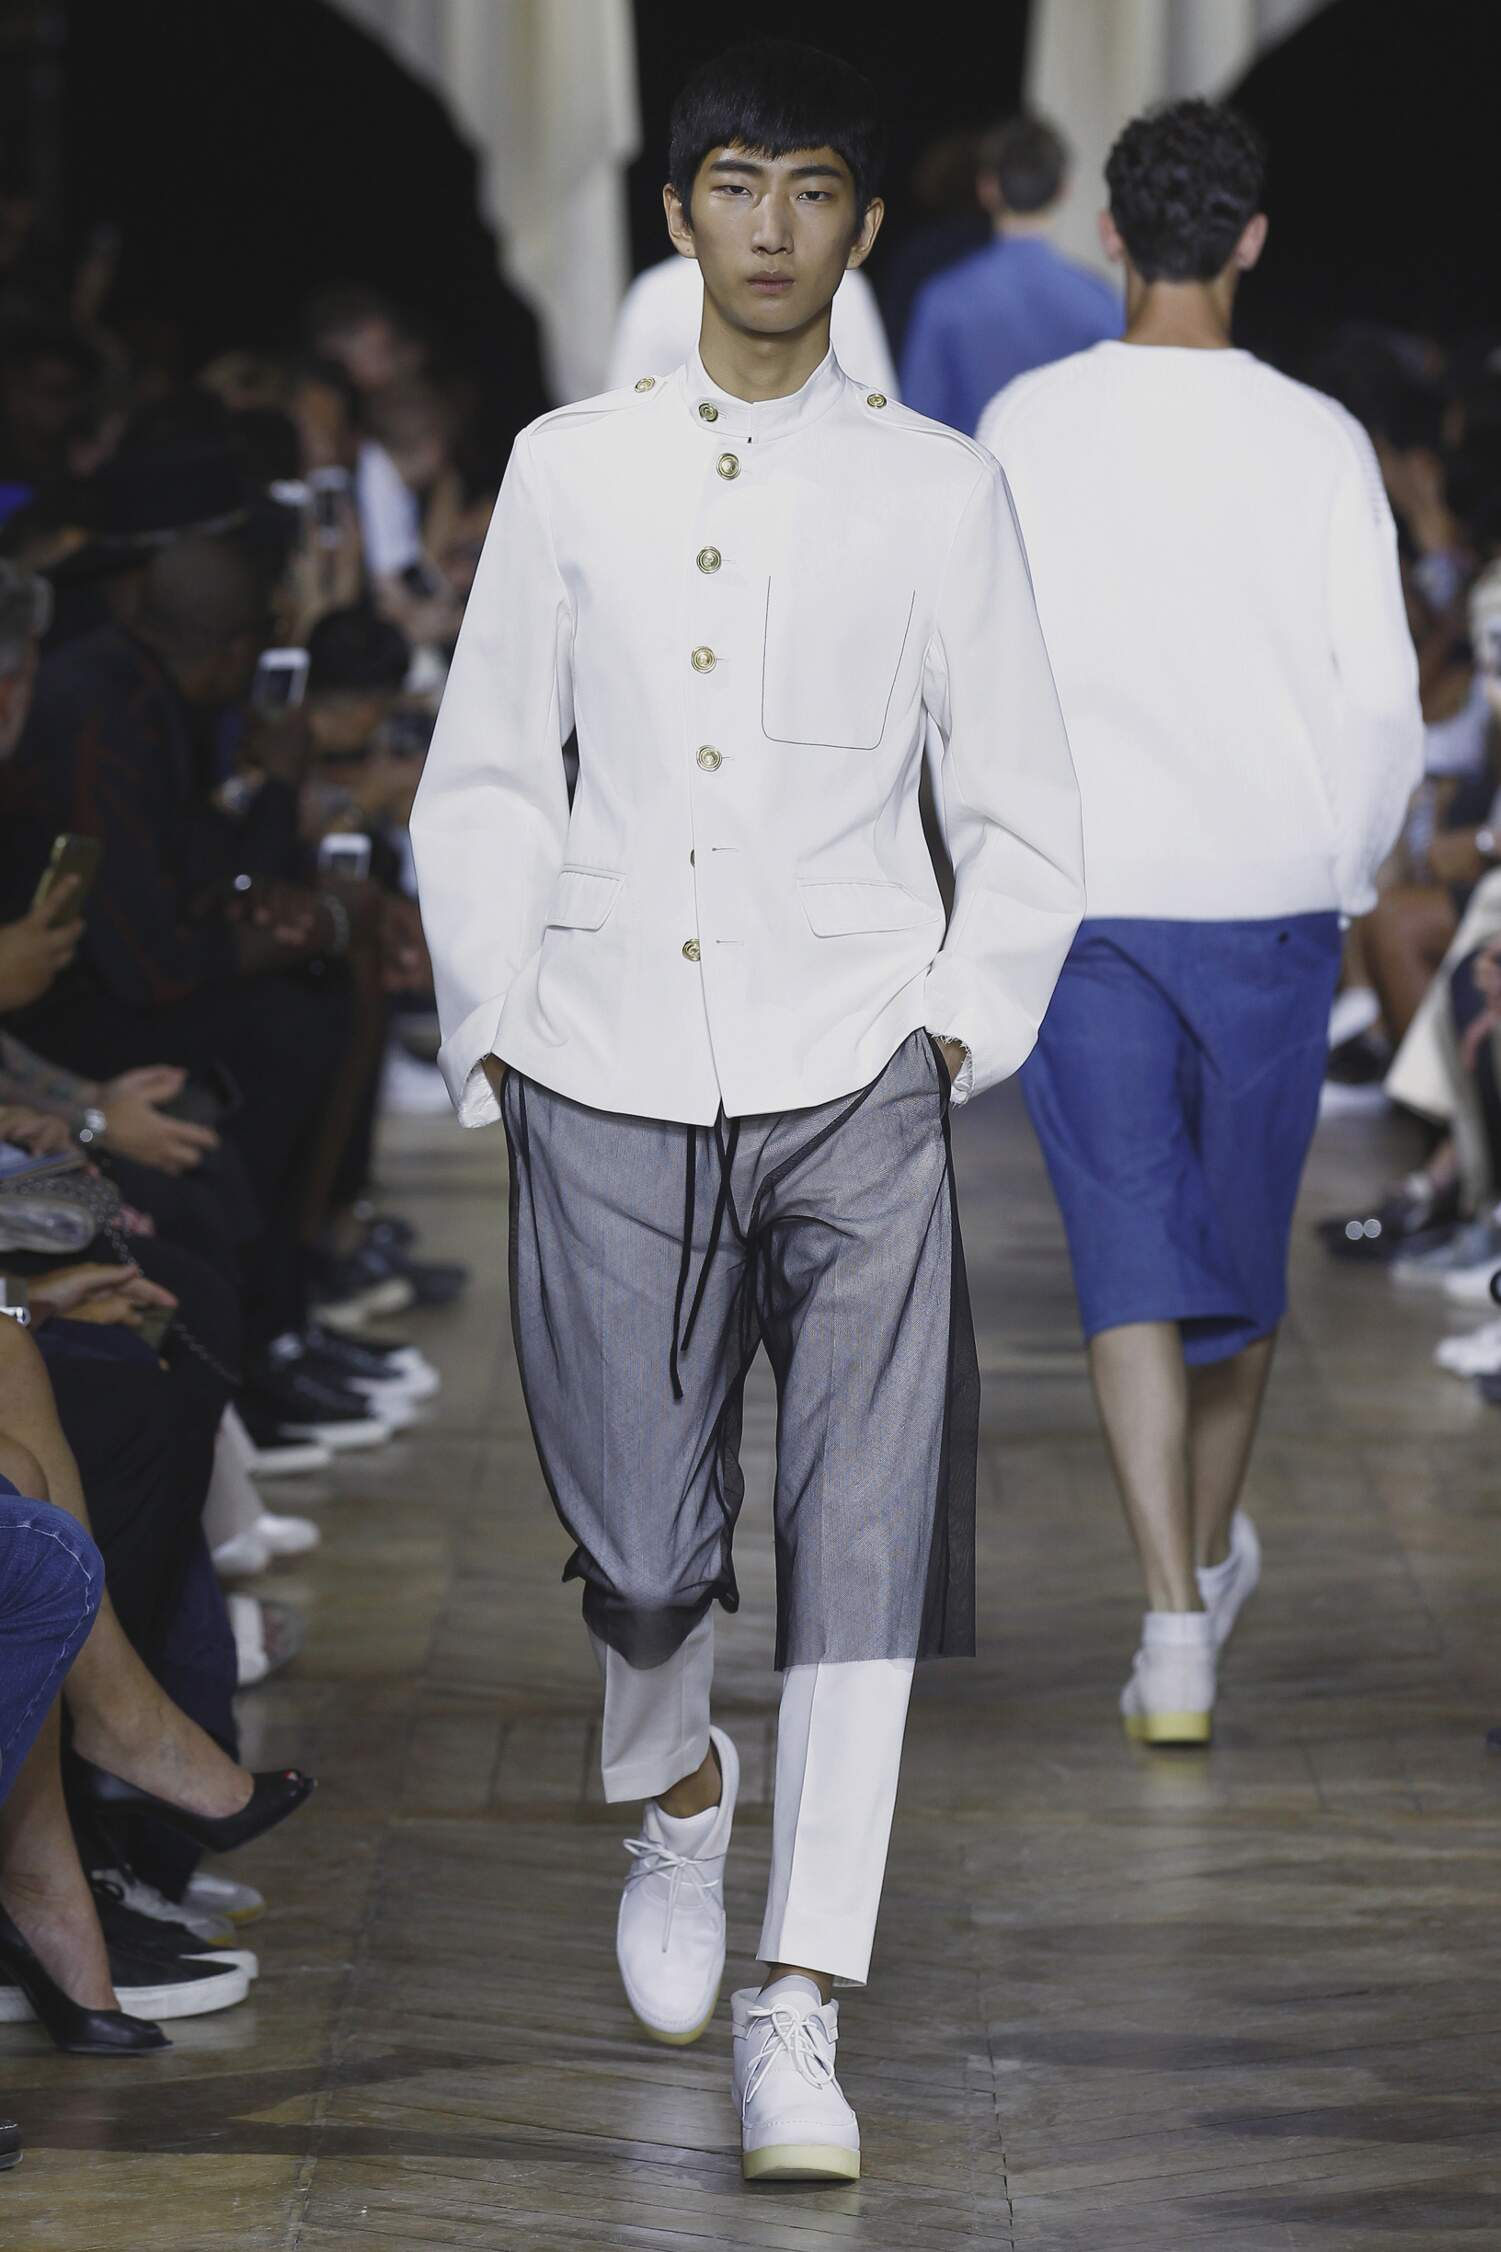 Fashion Menswear Phillip Lim Collection Catwalk